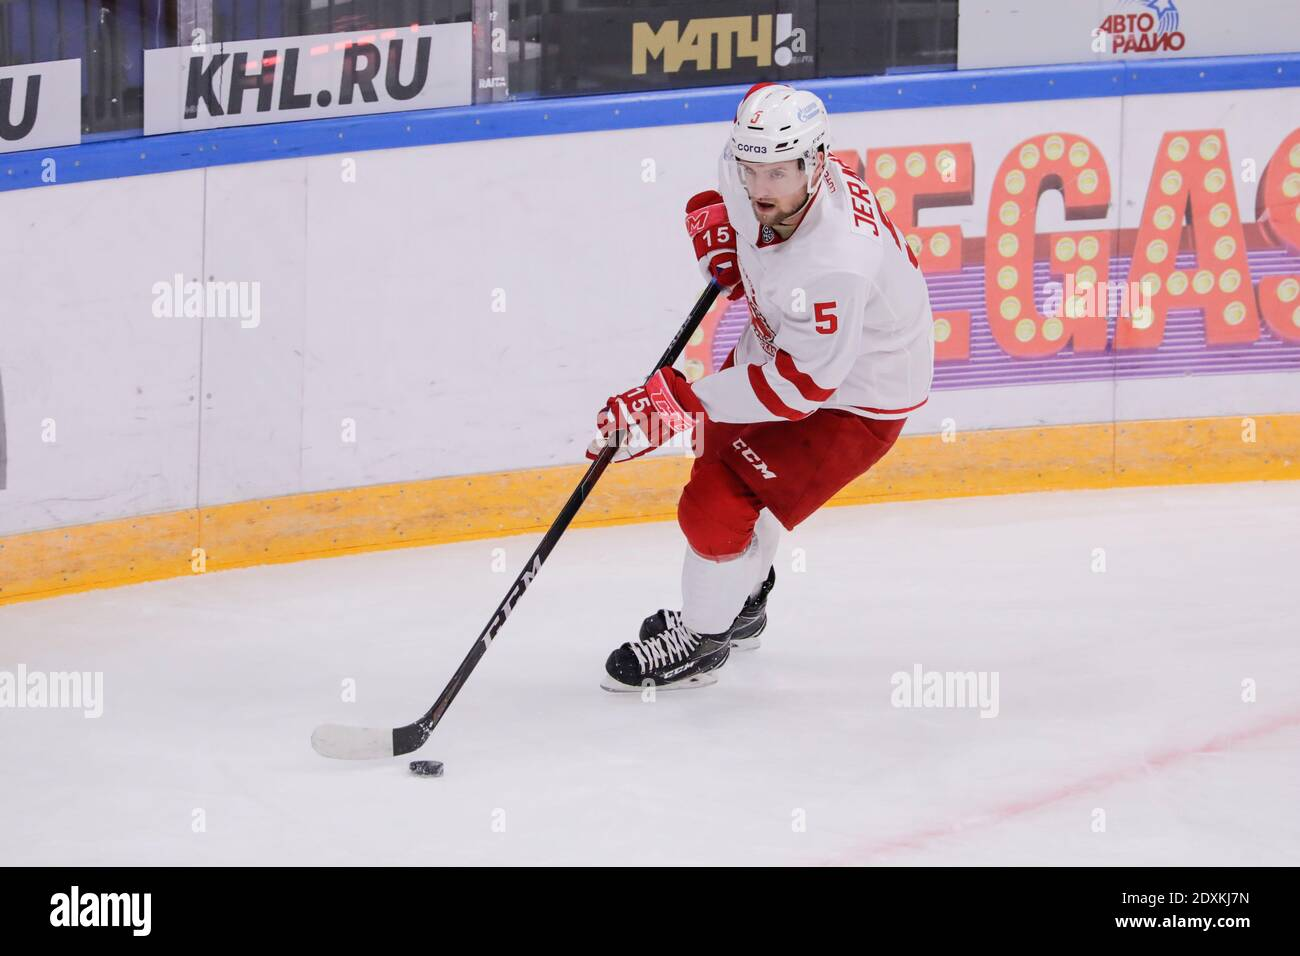 Moscow, Russia. 23rd Dec 2020. 2020 December 23rd - Moscow, Russia - Ice Hockey KHL Spartak Moscow vs Podolsk Vityaz - #5 Jakub Jerabek Credit: Marco Ciccolella/Alamy Live News Stock Photo